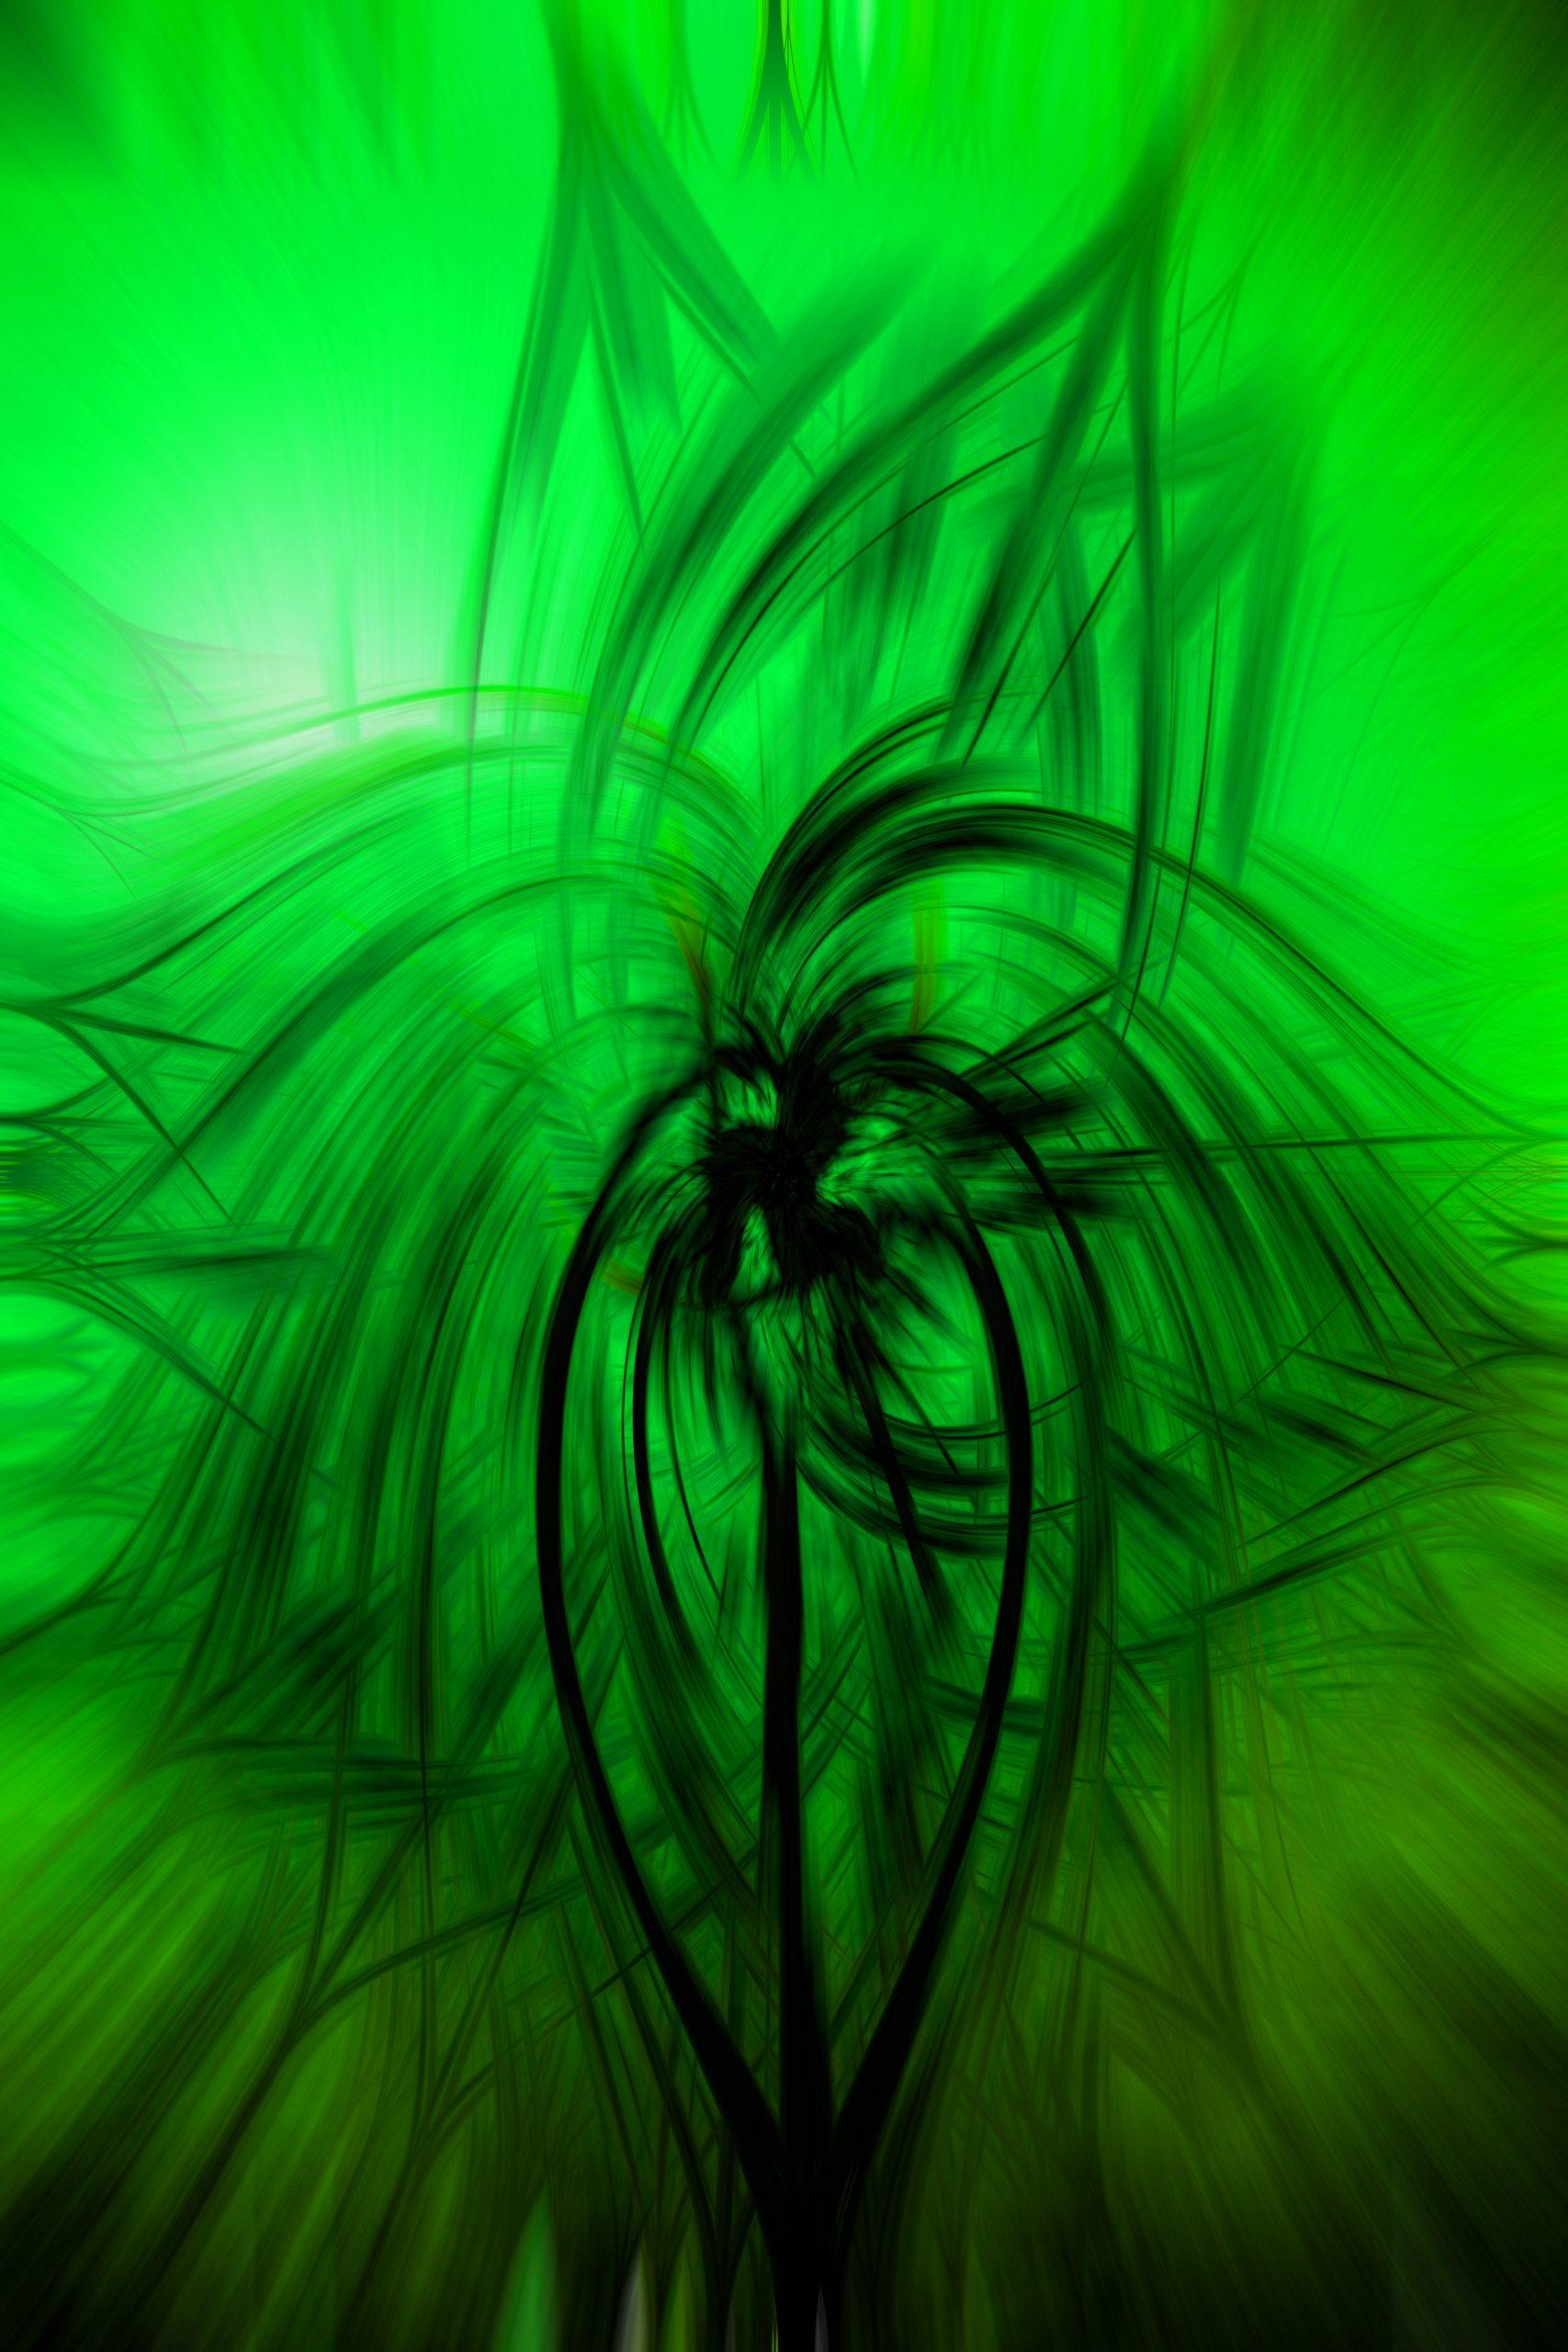 Green abstract design illustration